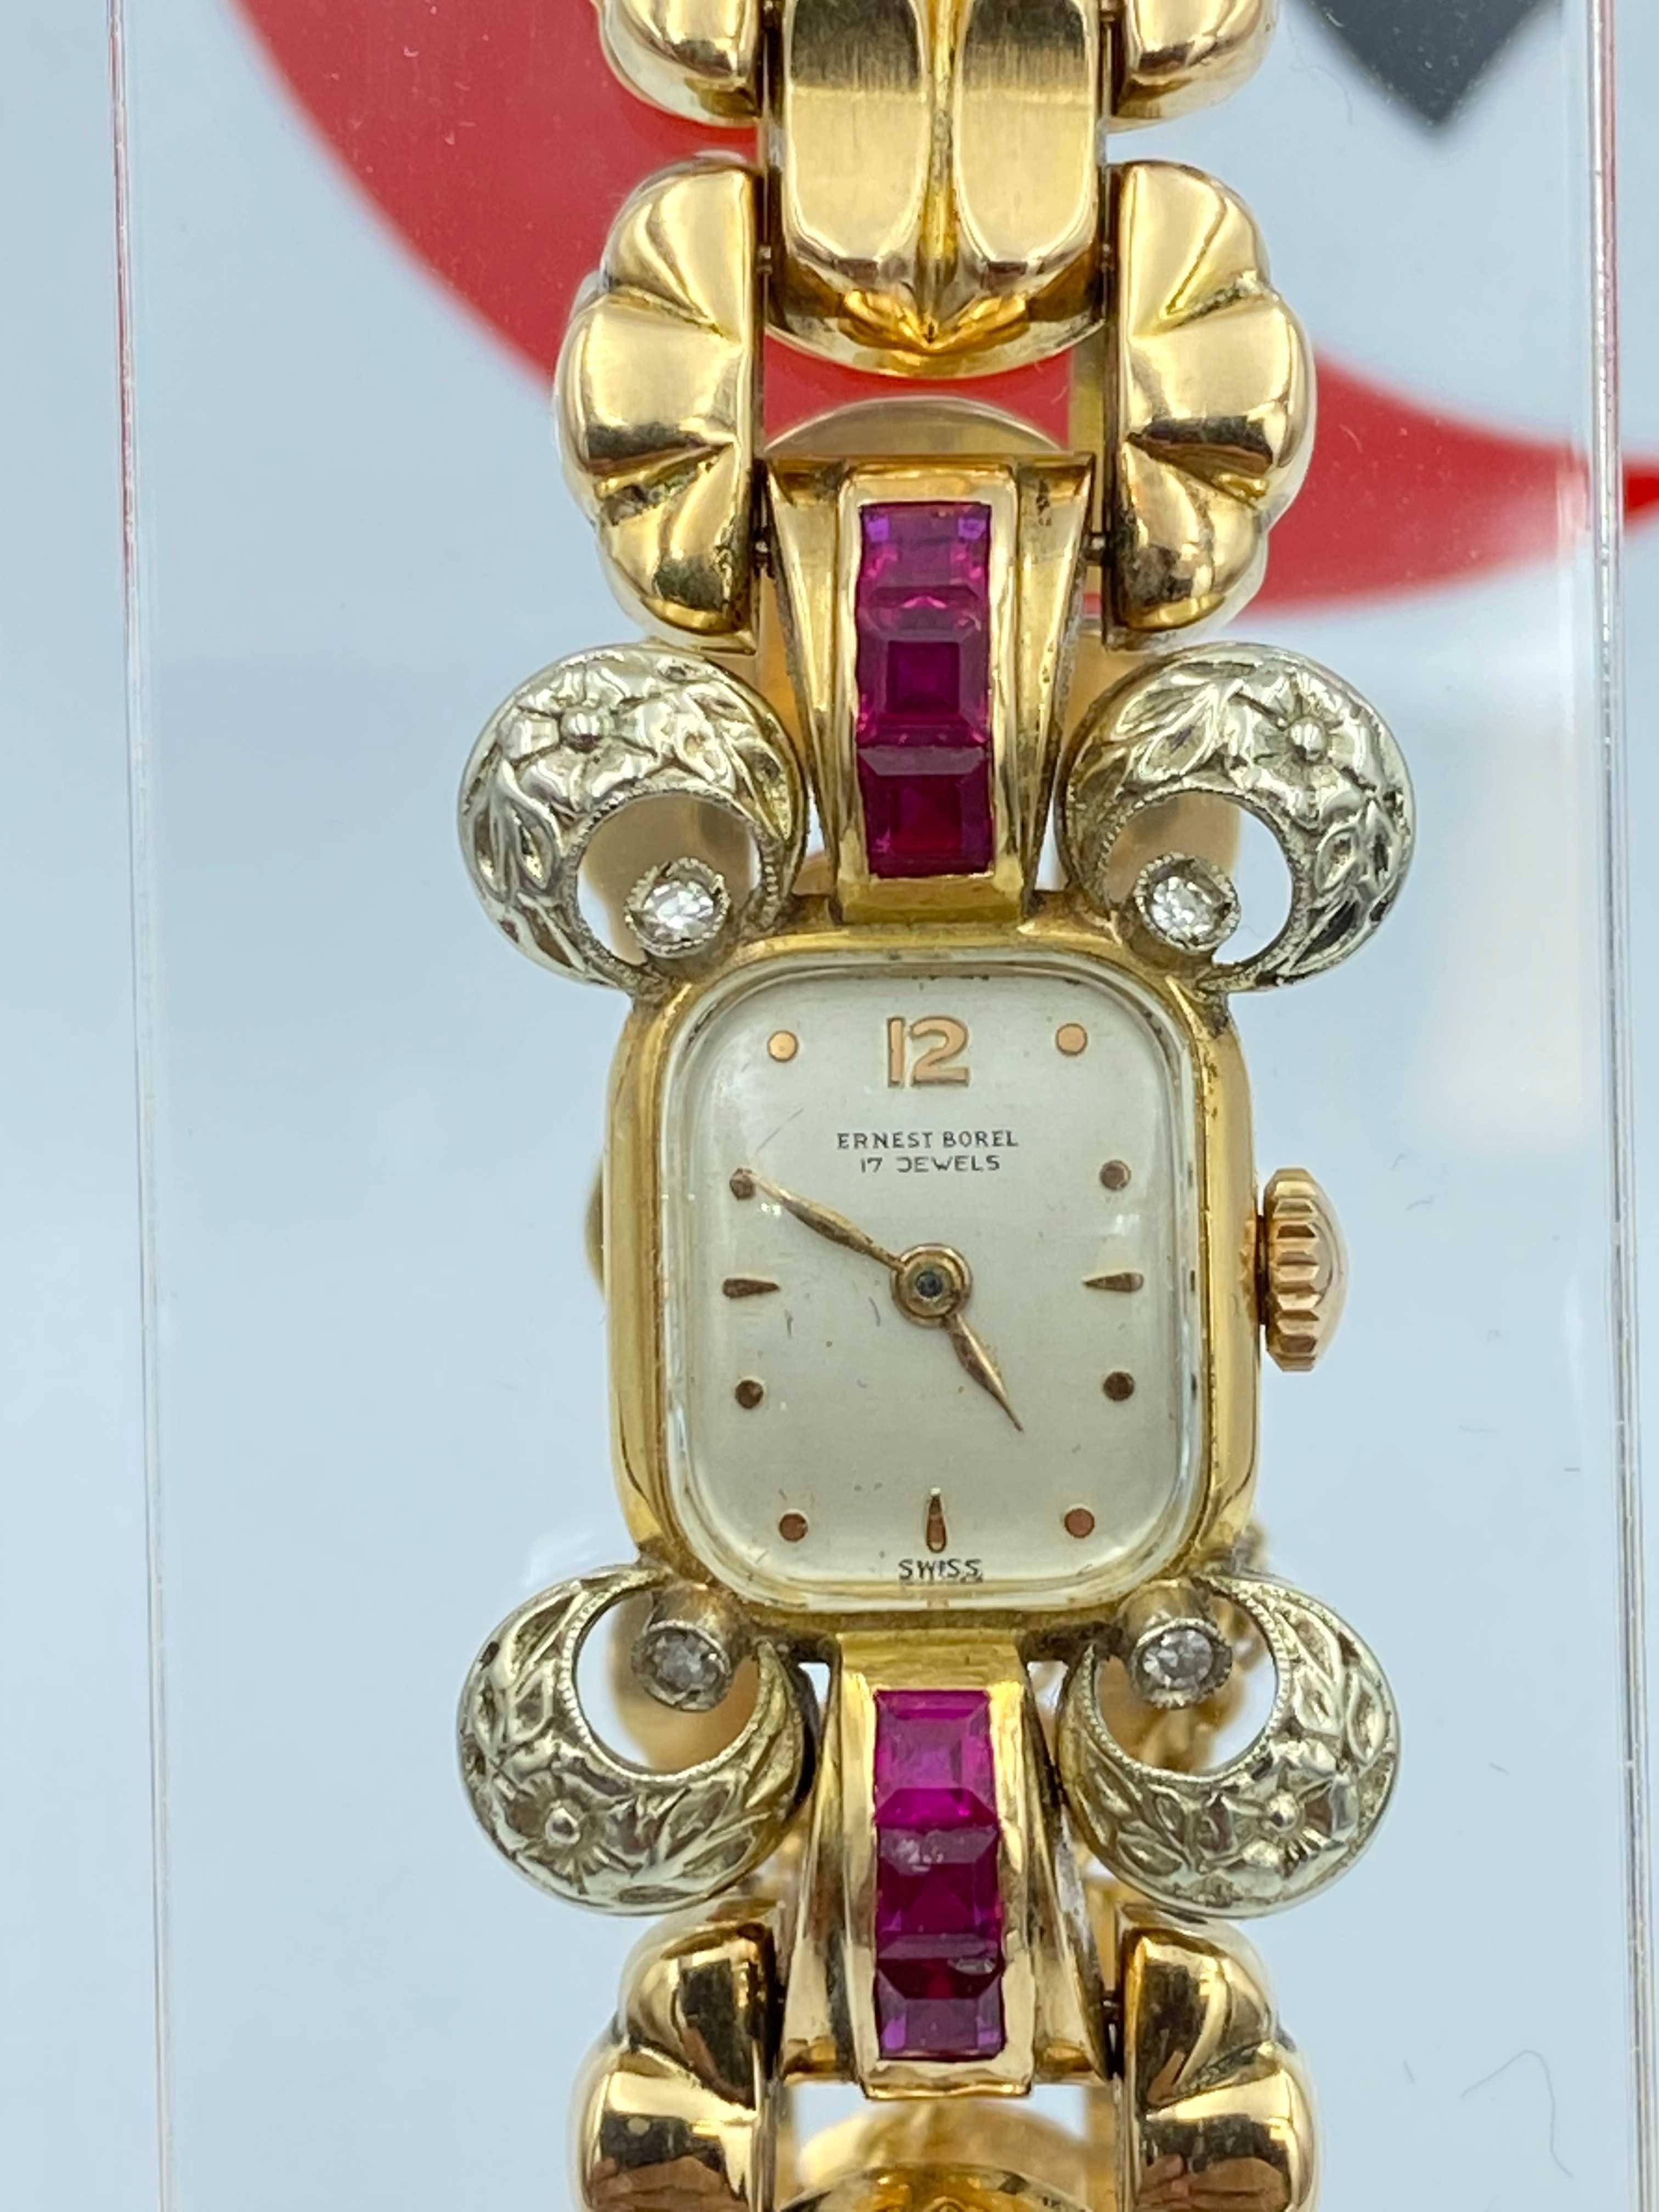 Zegarek złoty 18k Ernest Borel z brylantami i rubinami